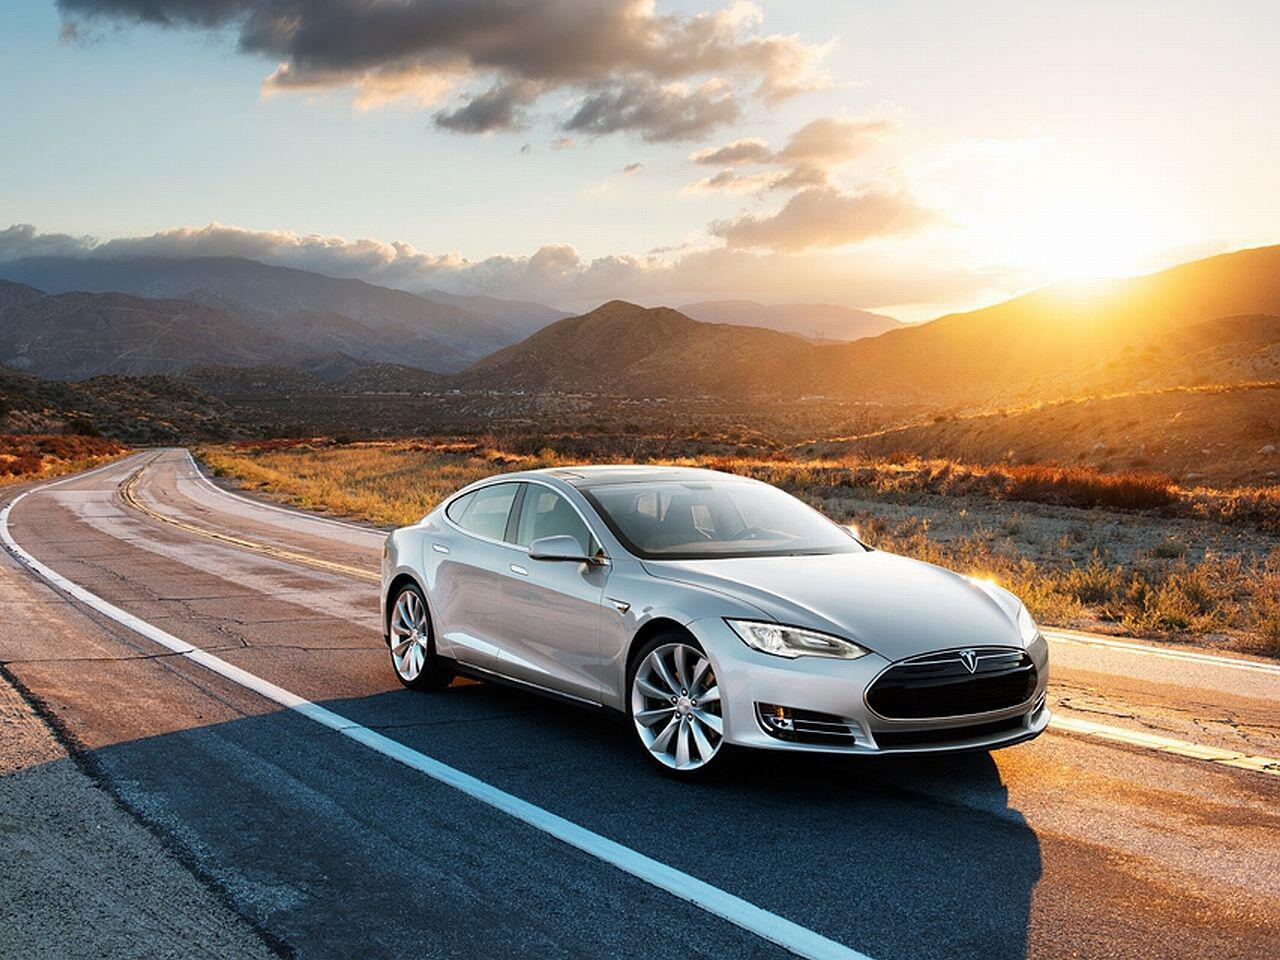 Bild zu Amerikanische Elektro-Limousine: Tesla Model S